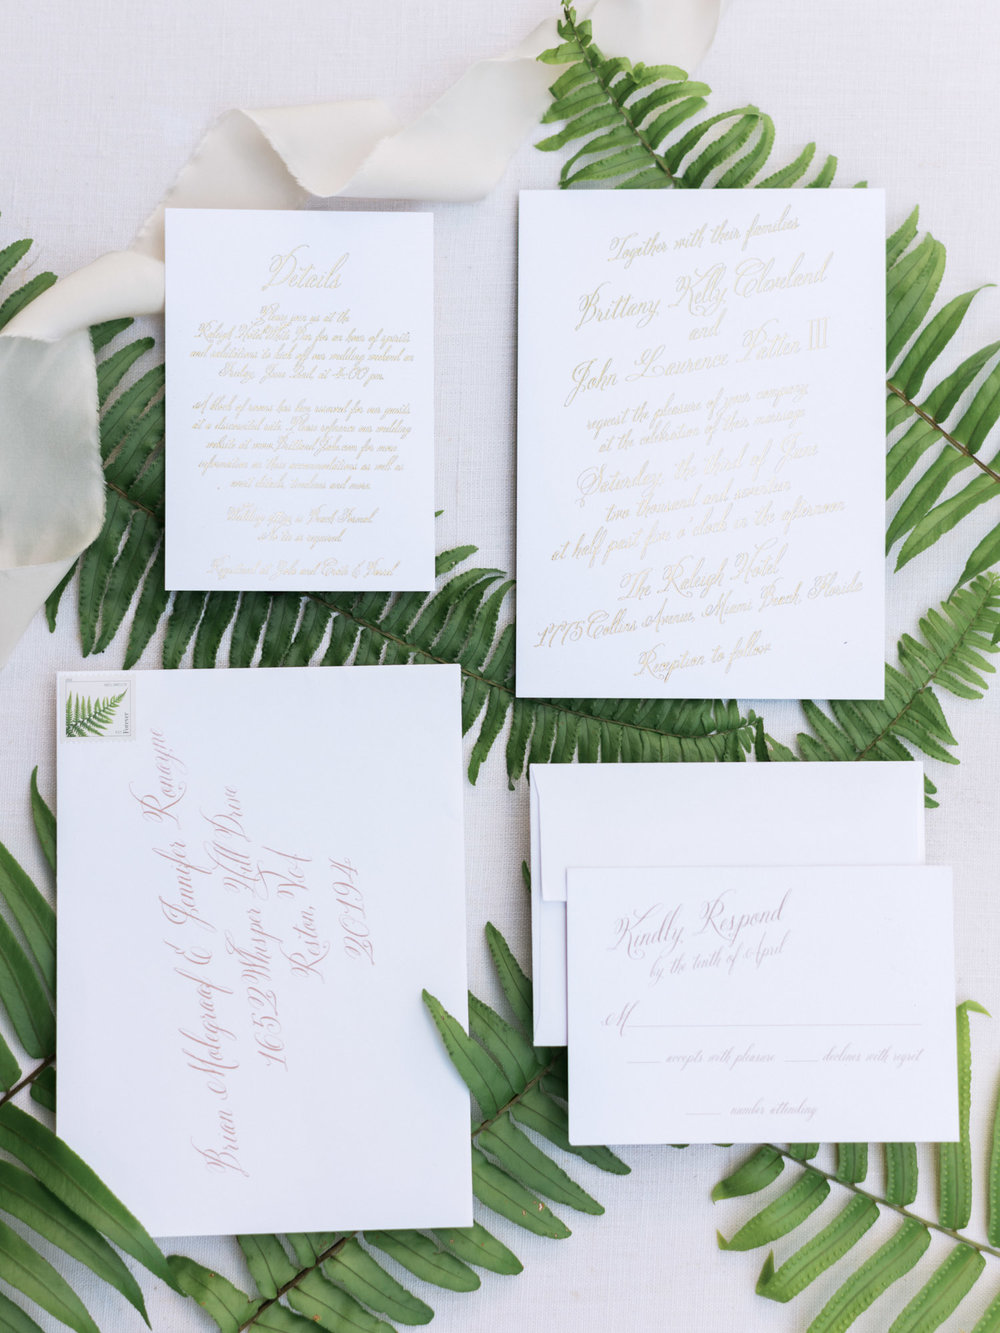 raleigh-miami-beach-destination-film-wedding-5754.jpg